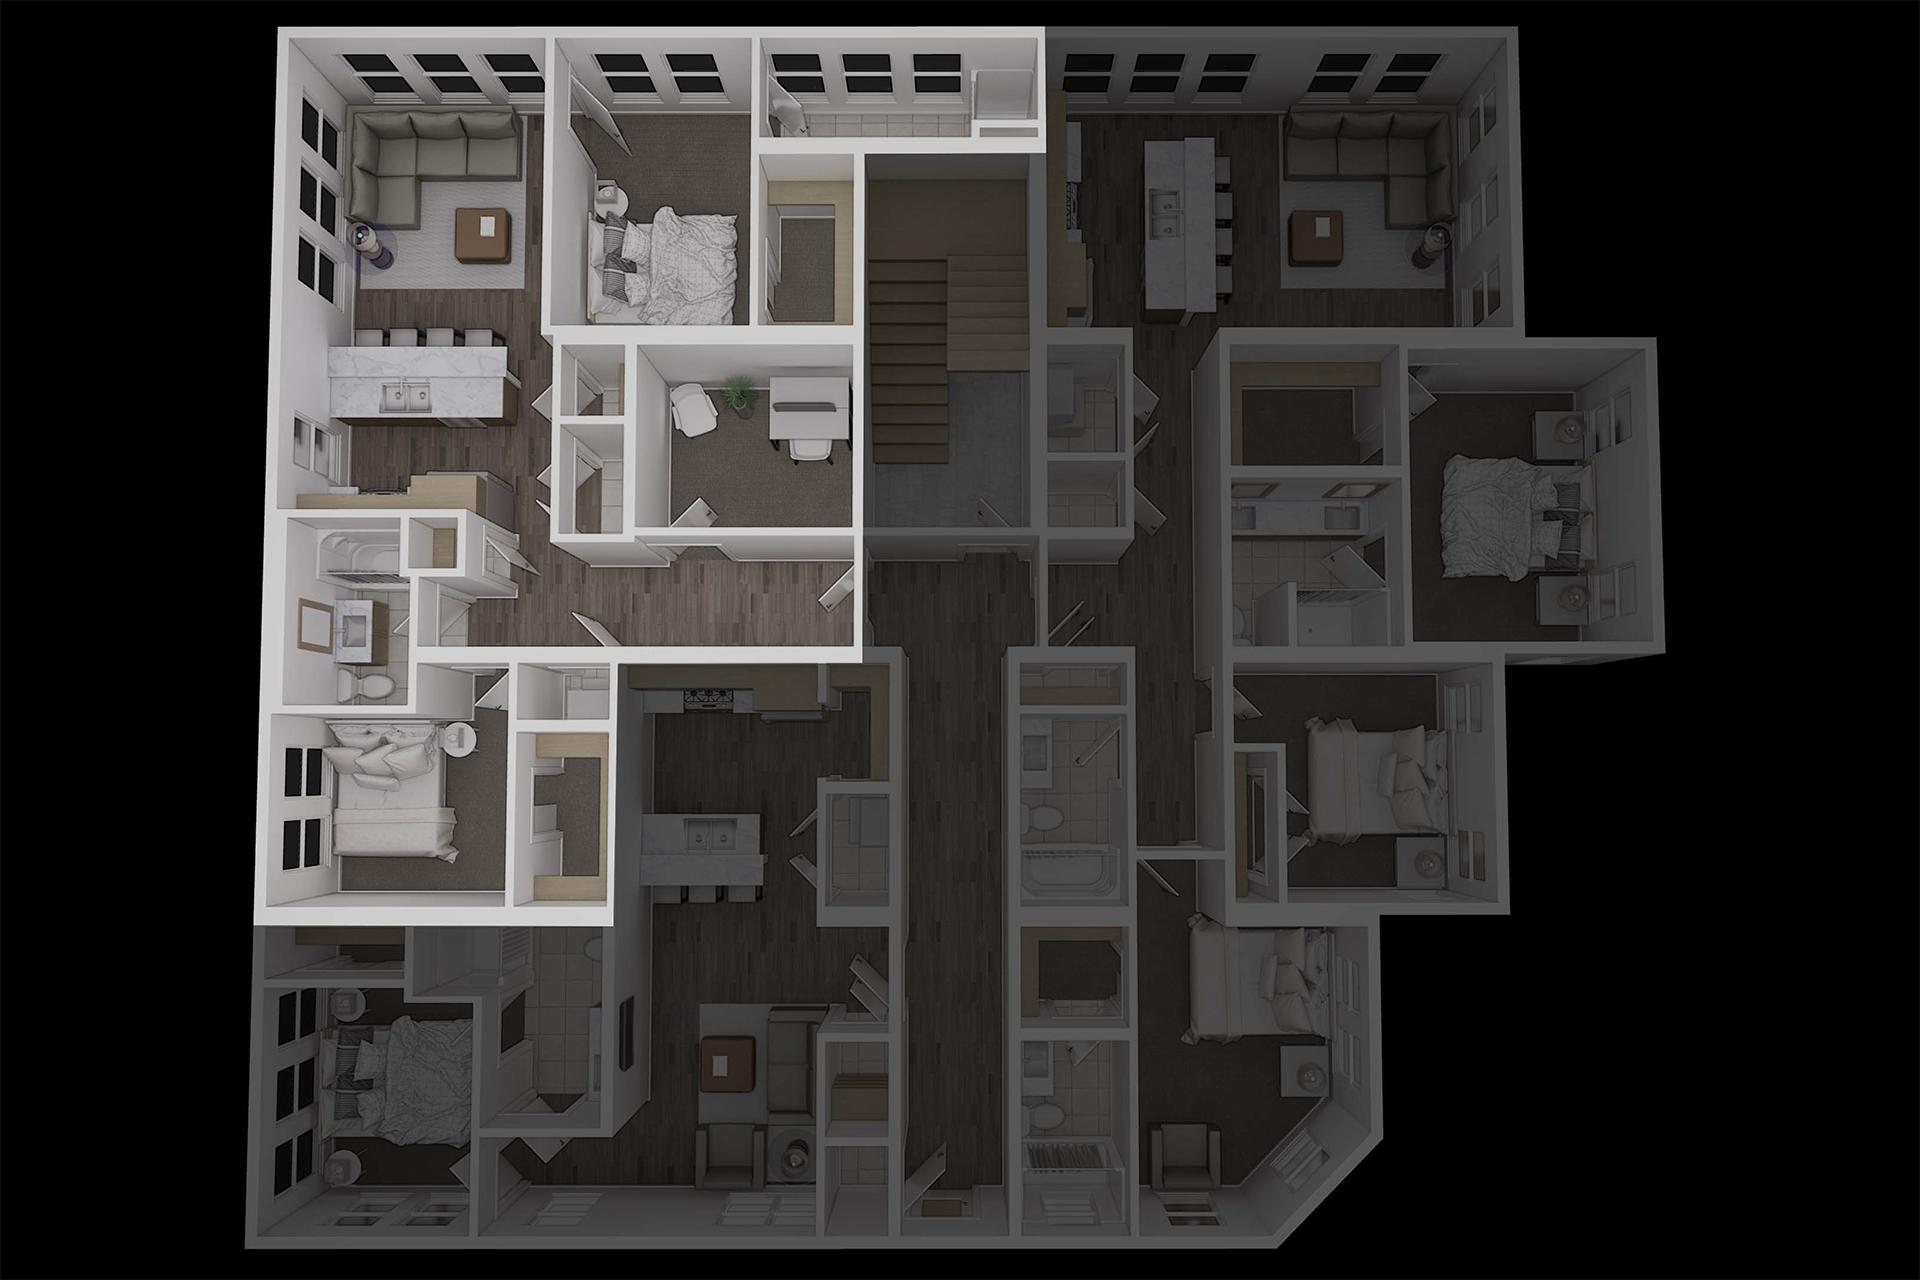 2 Bedroom Option